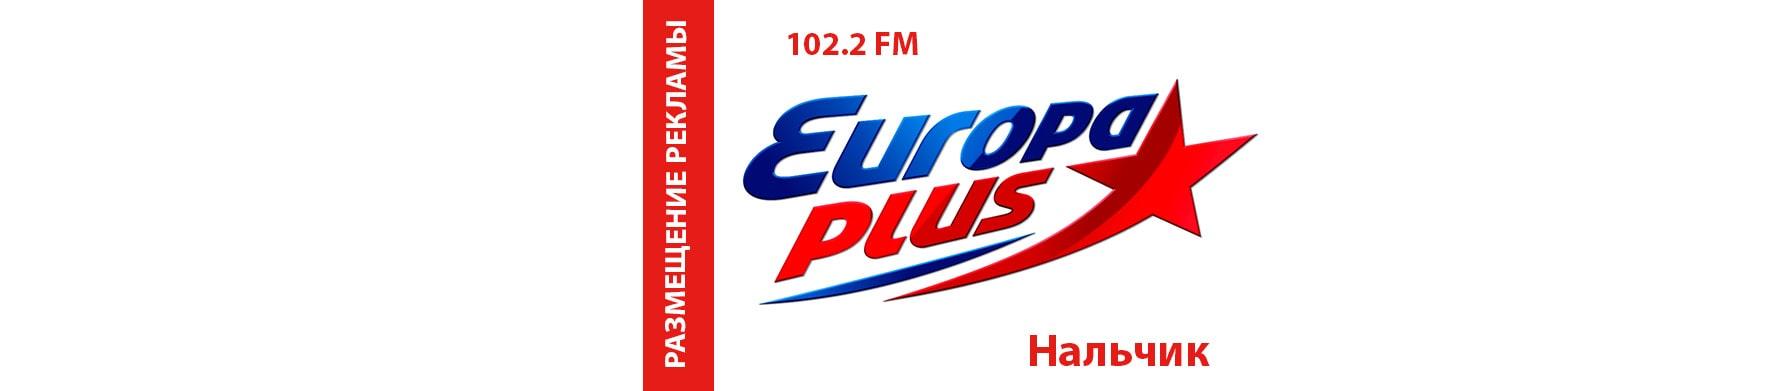 Реклама на радио в Кабардино-Балкарии Европа Плюс